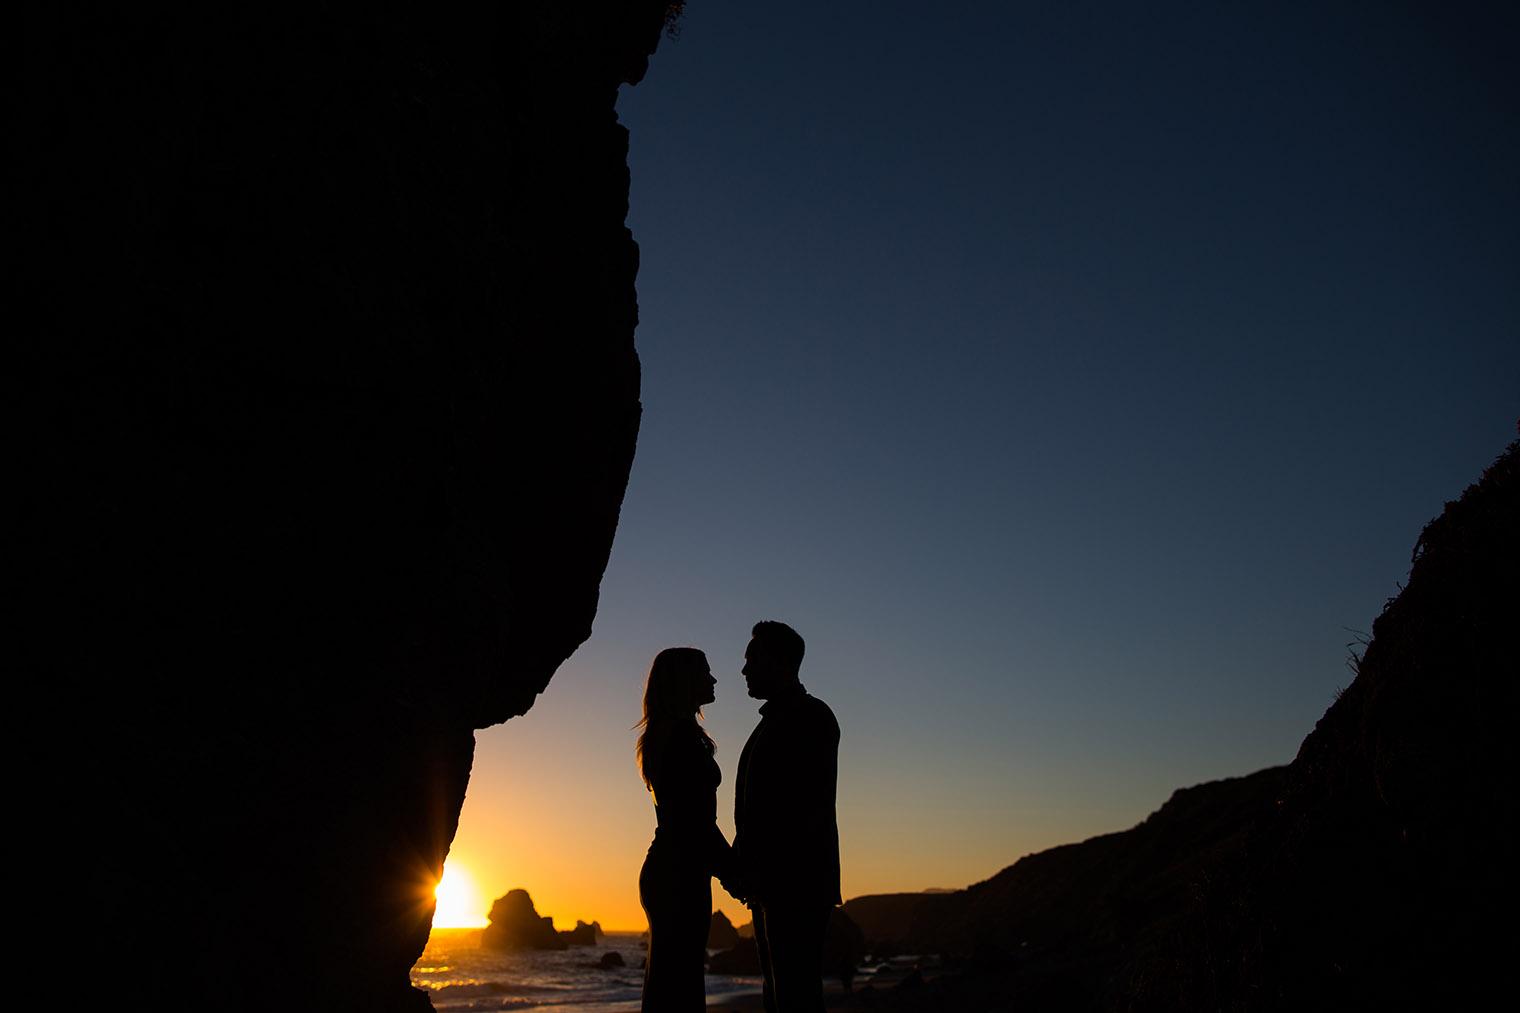 sonoma coast state park sunset photos